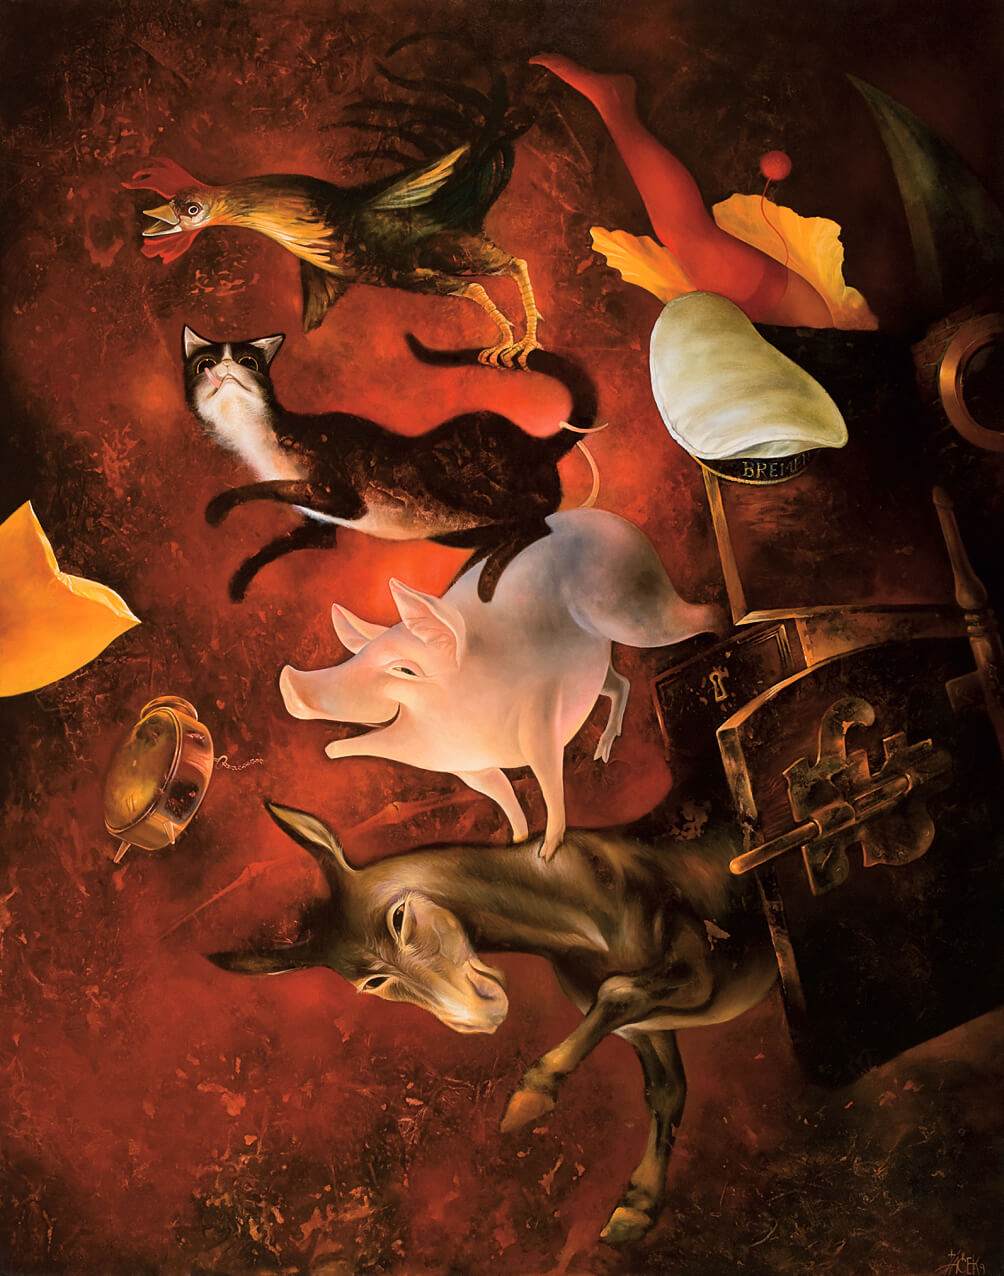 oil on canvas, 120 x 90 cm, 2009